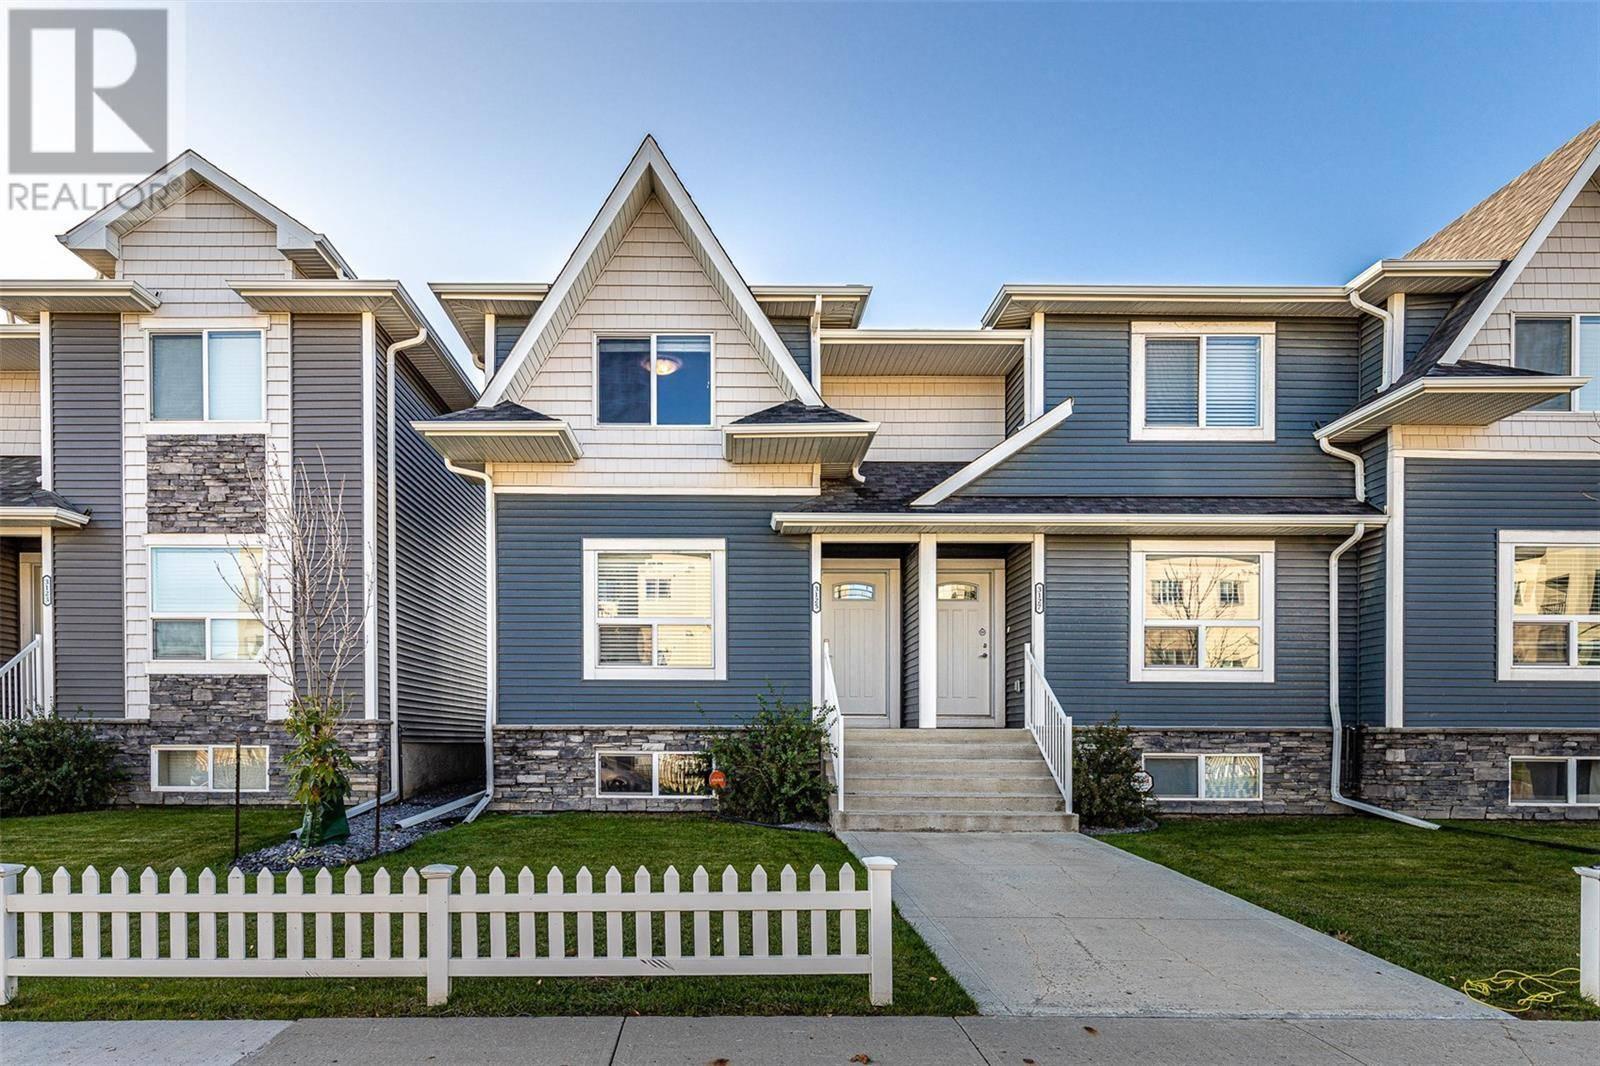 Townhouse for sale at 3125 Mcclocklin Rd Saskatoon Saskatchewan - MLS: SK787796